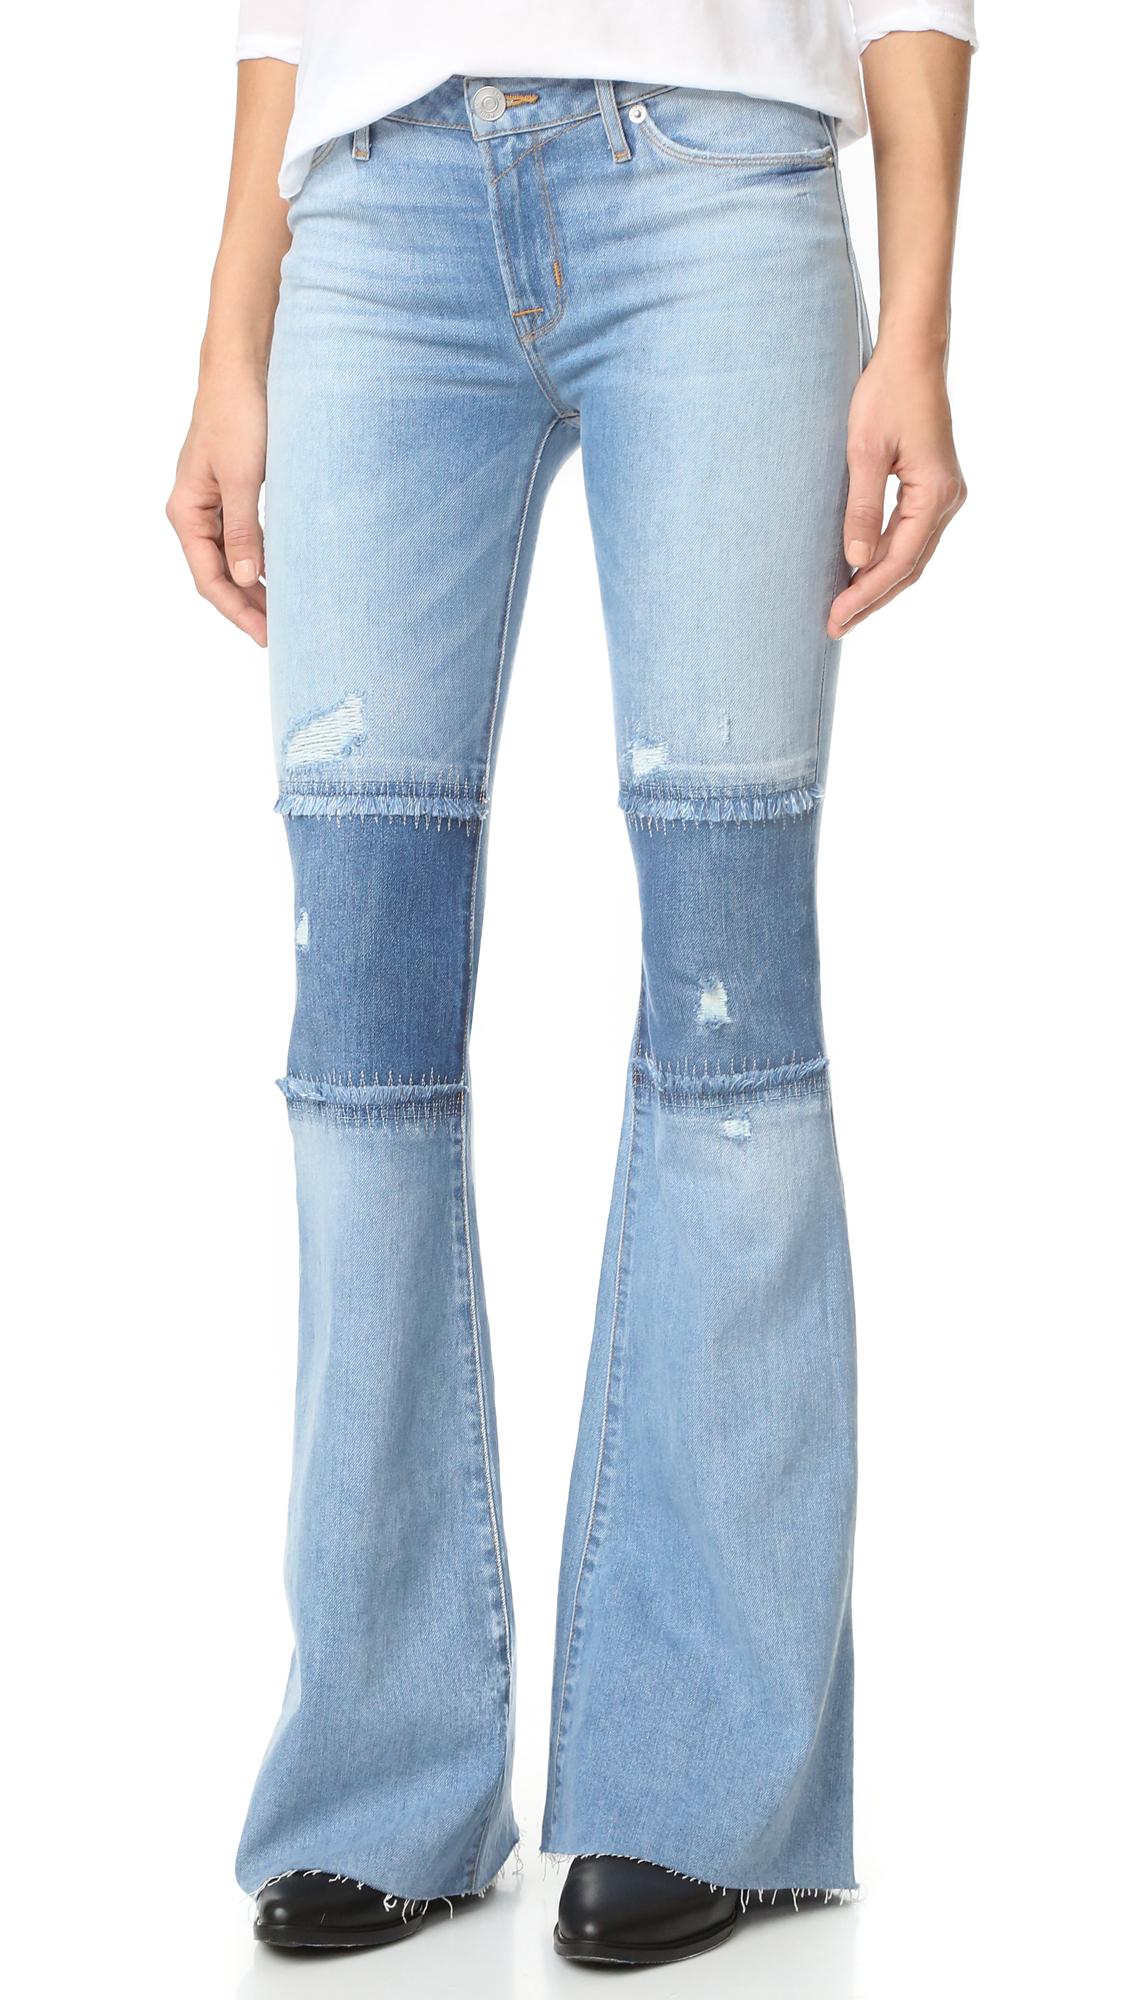 Hudson Custom Mia 5 Pocket Jeans - Royal Delta at Shopbop